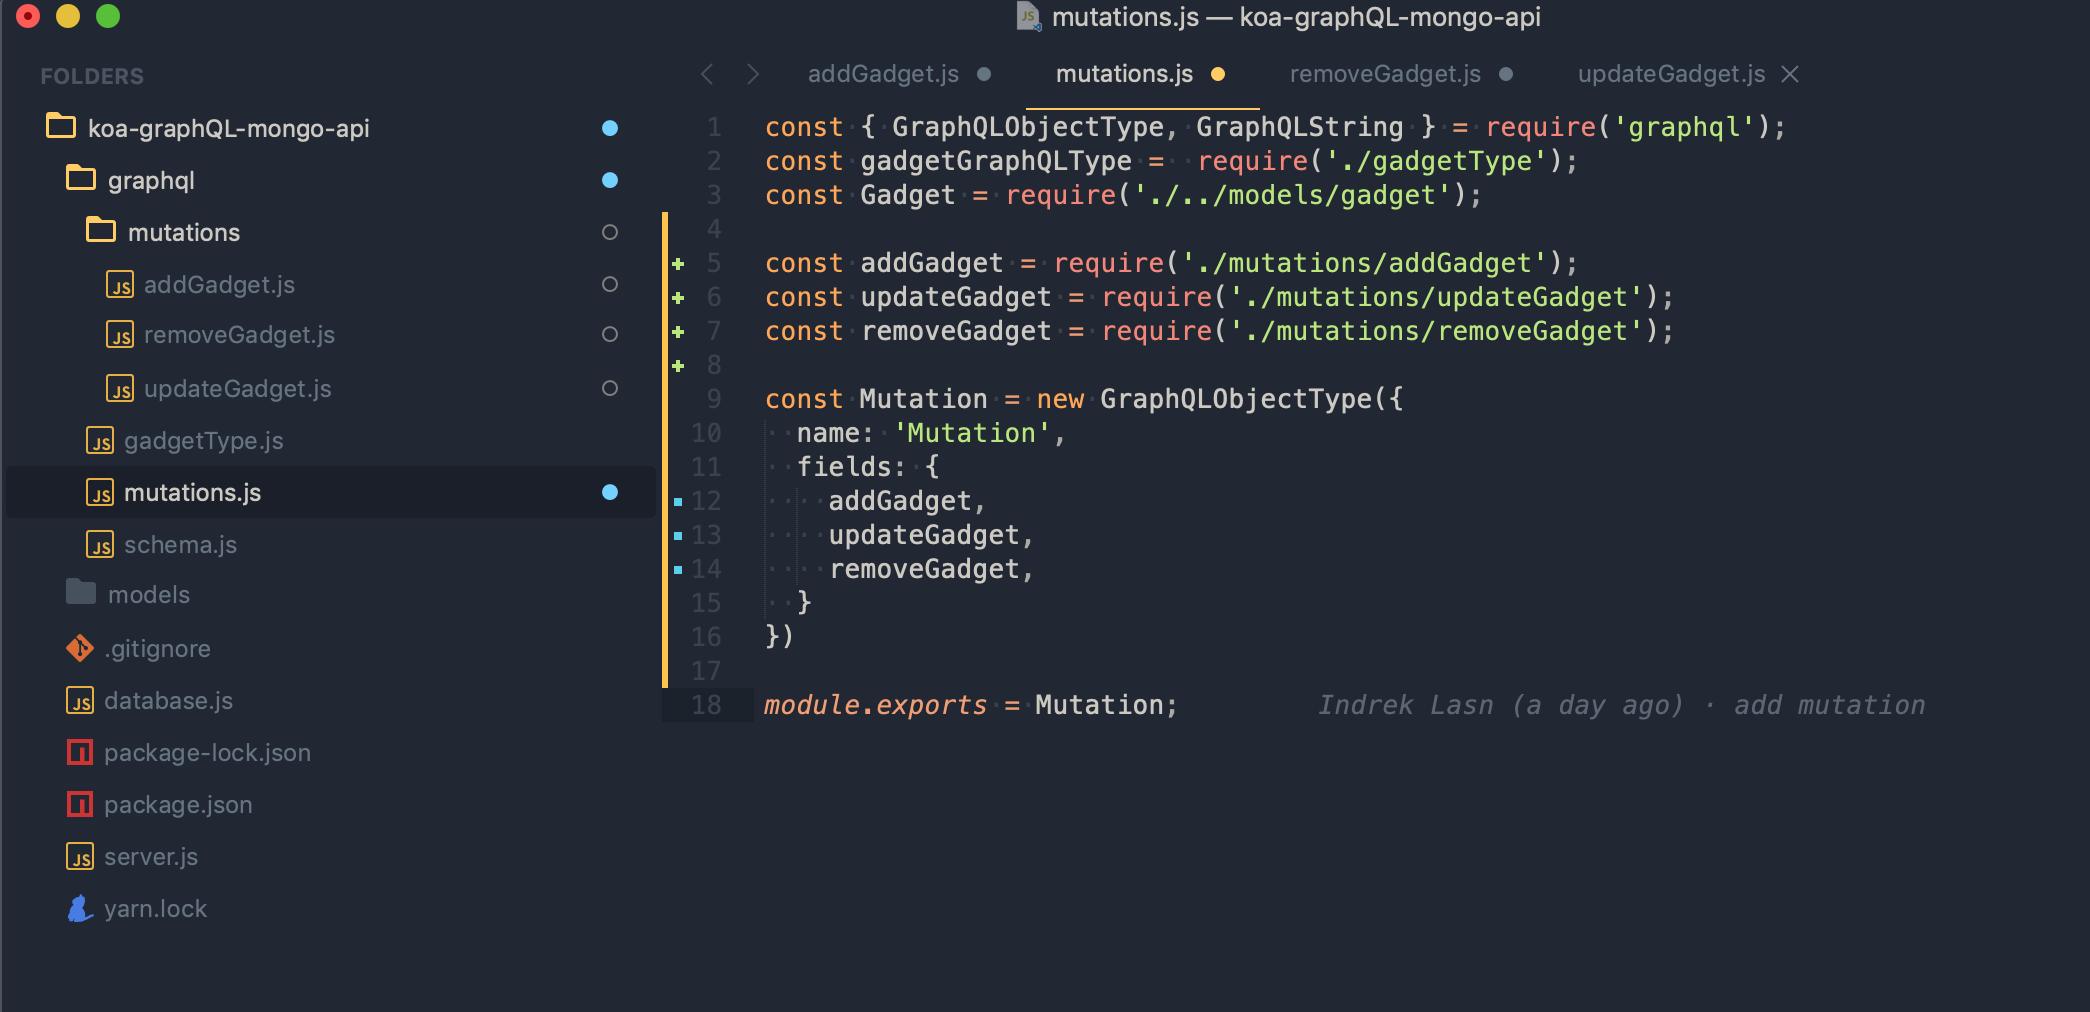 How to setup a powerful API with GraphQL, Koa and MongoDB